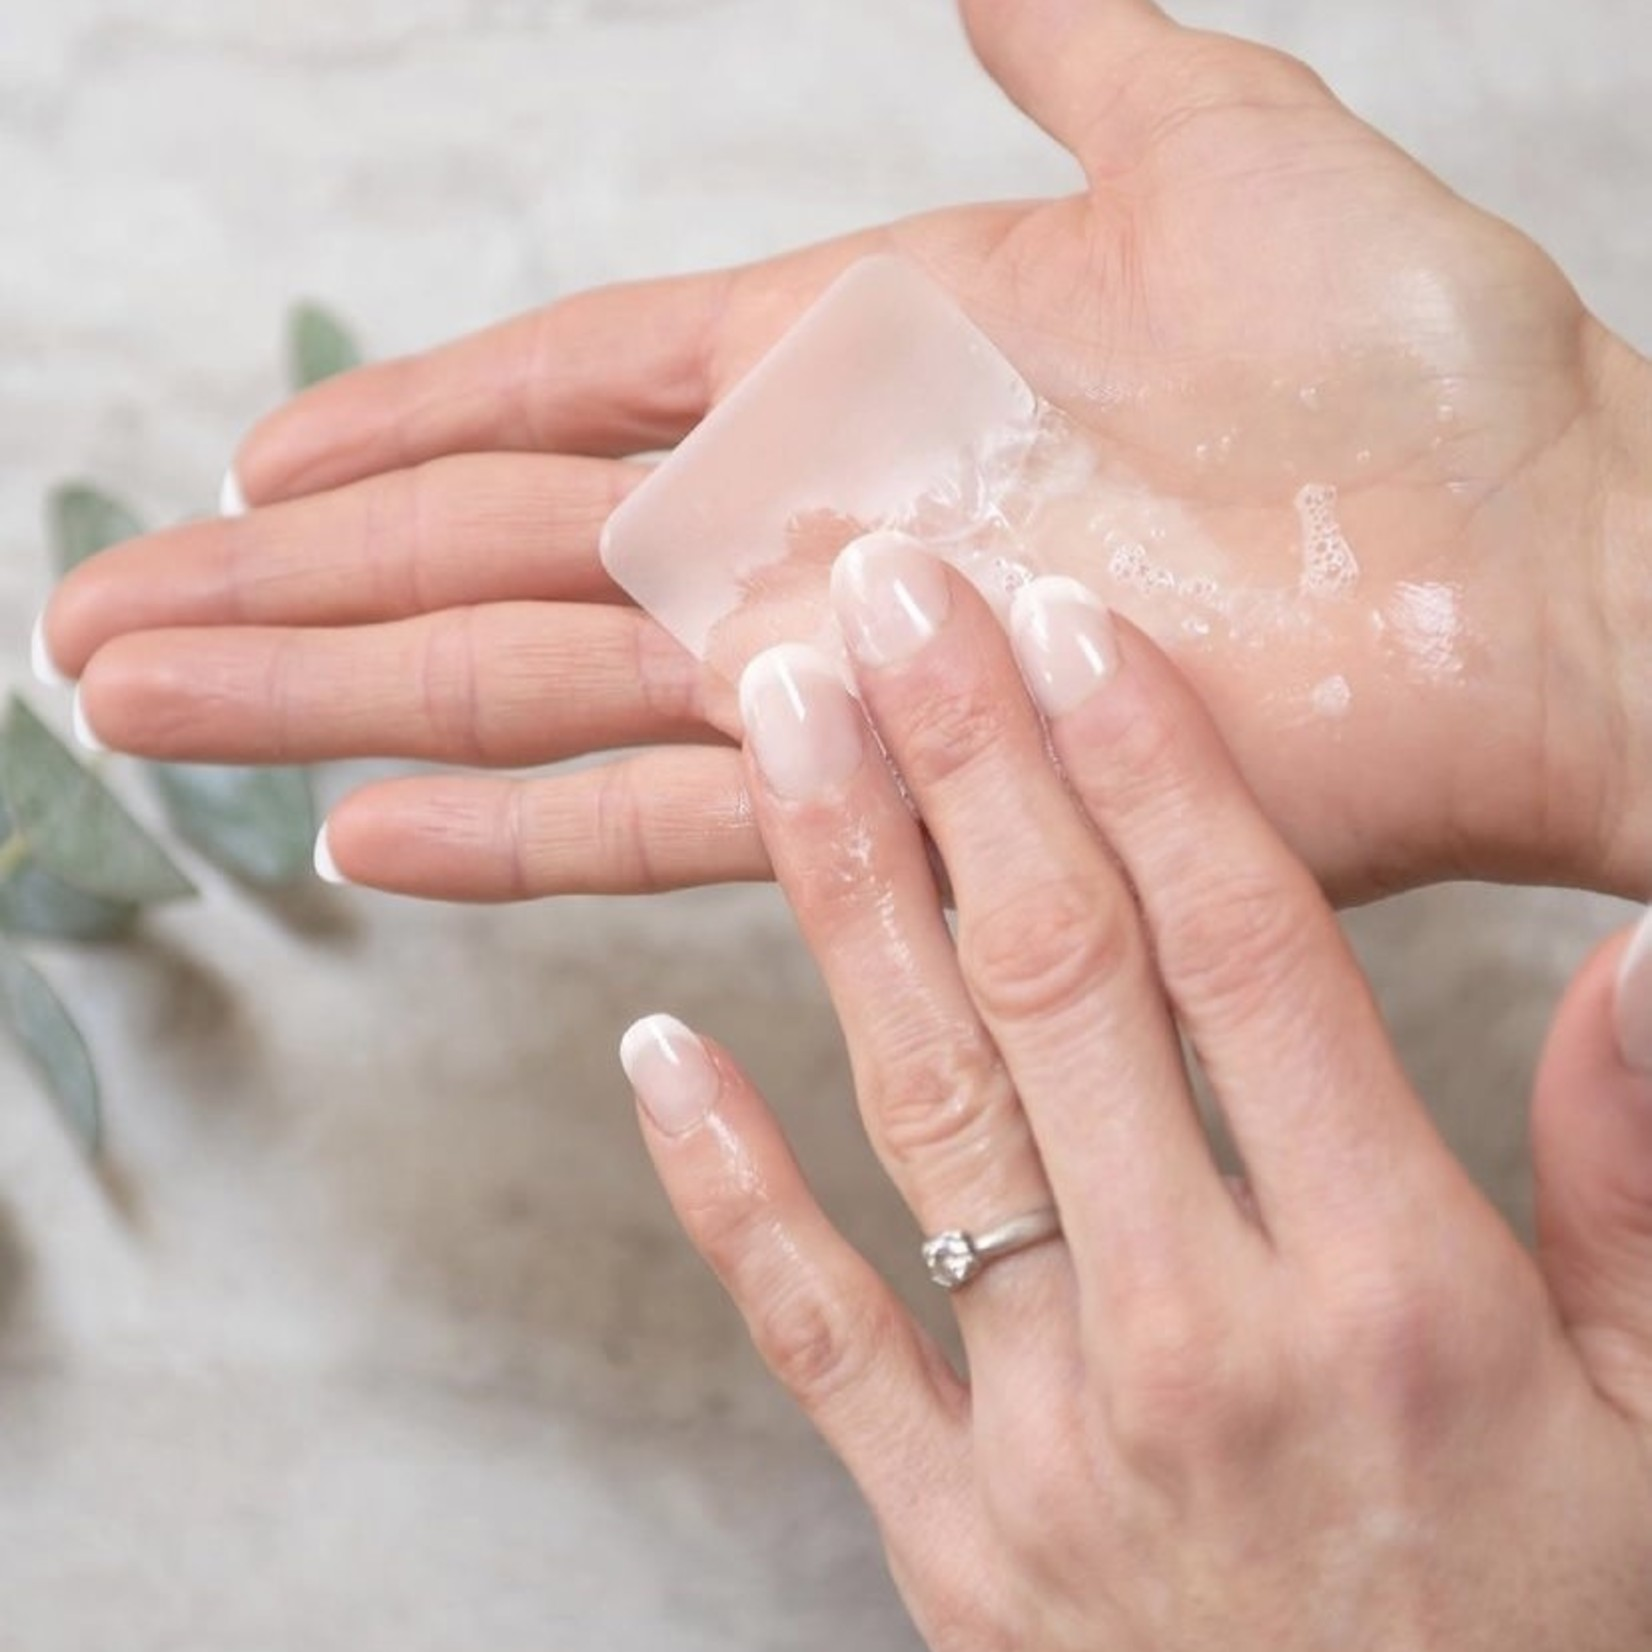 Studio Oh Single Use Soap